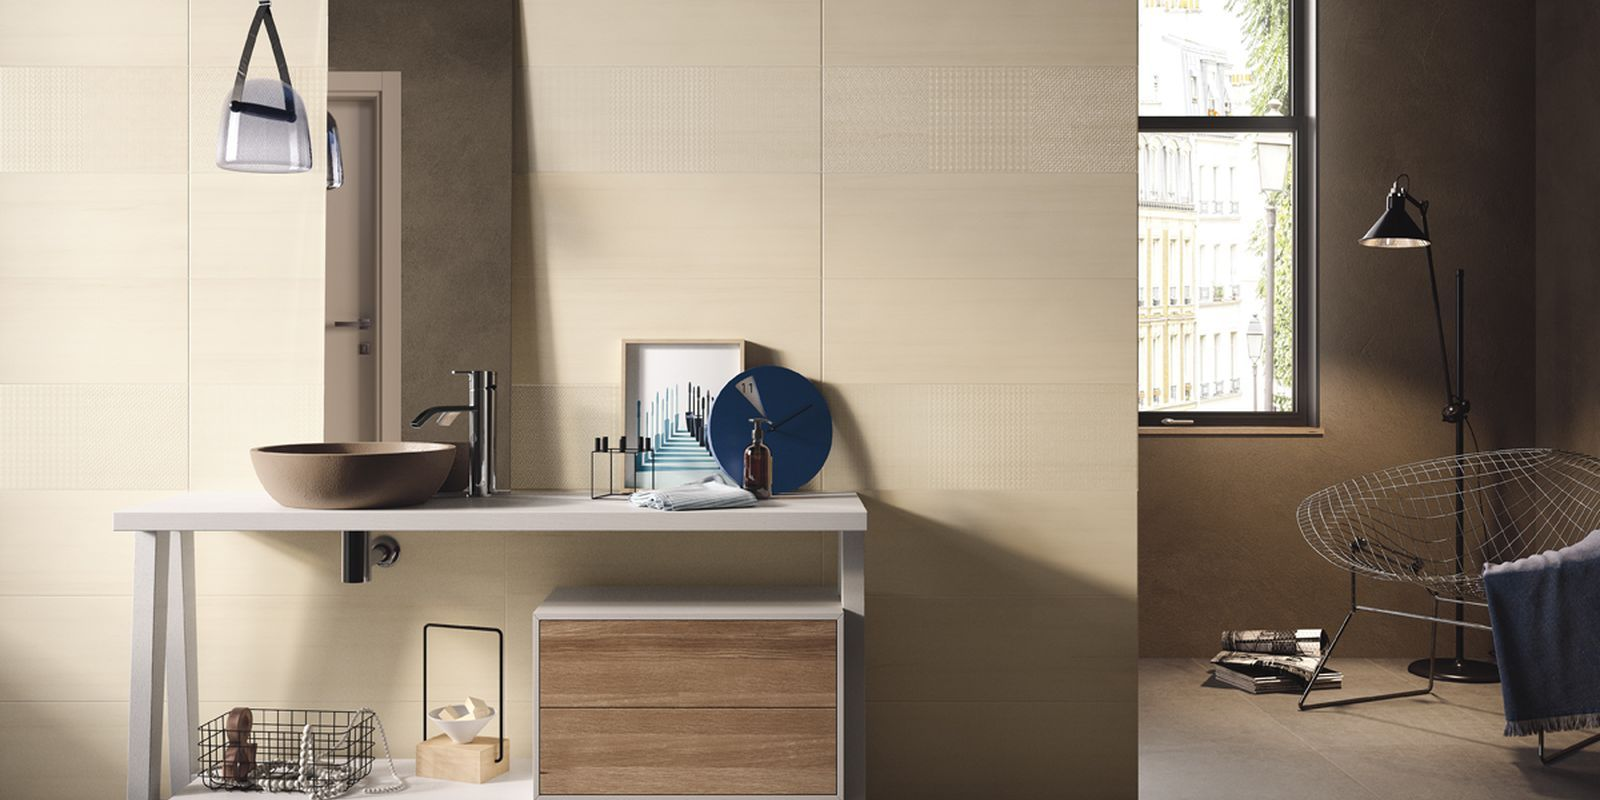 Piastrelle shades bagno moderno ceramica bicottura da - Ceramica bagno moderno ...